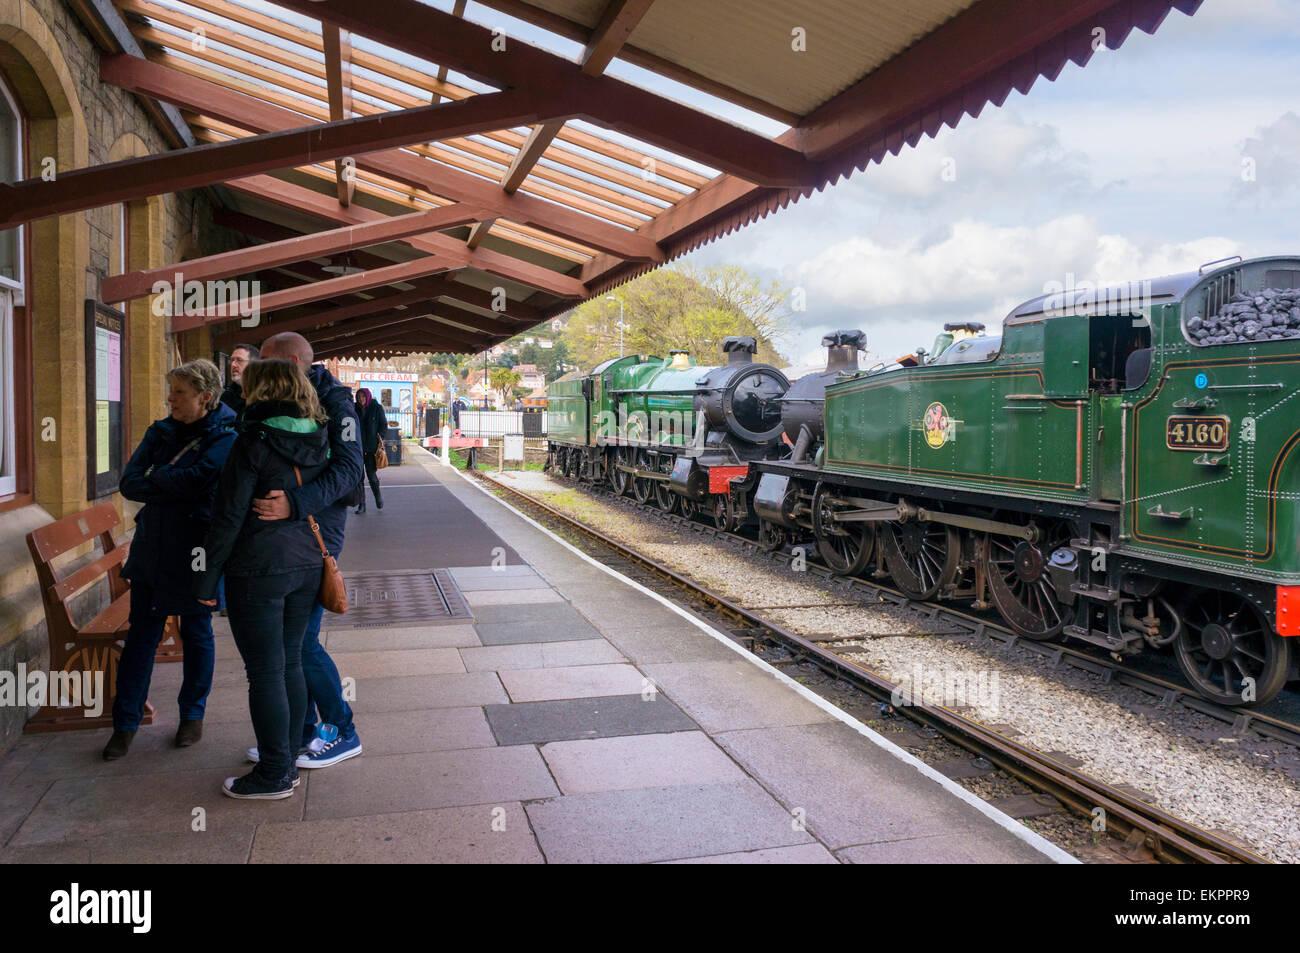 Steam trains and platform at West Somerset Railway station, Minehead, UK - Stock Image